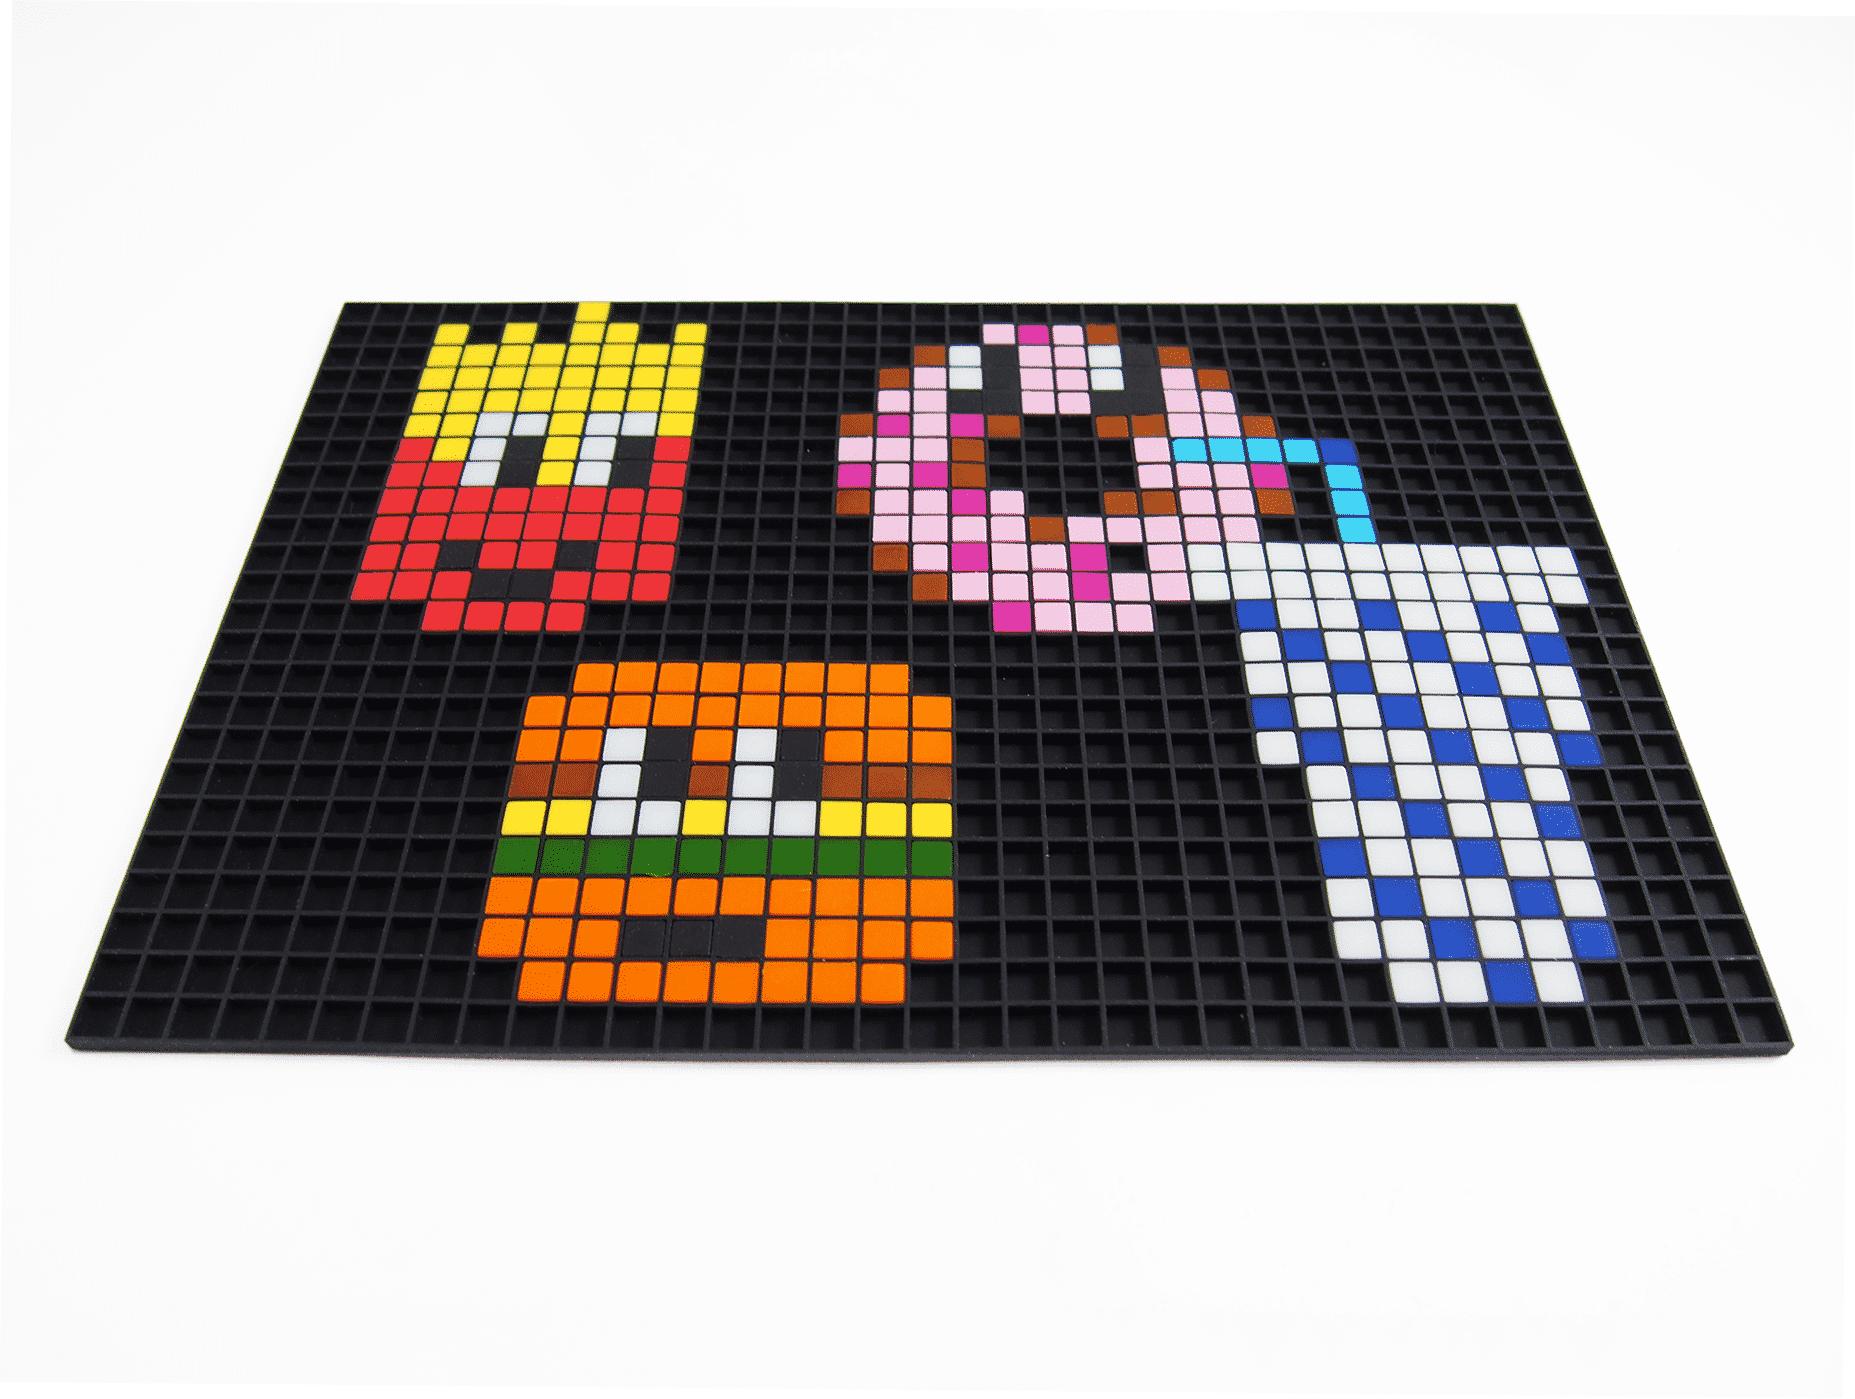 Burger Frites Pixel Art La Manufacture Du Pixel